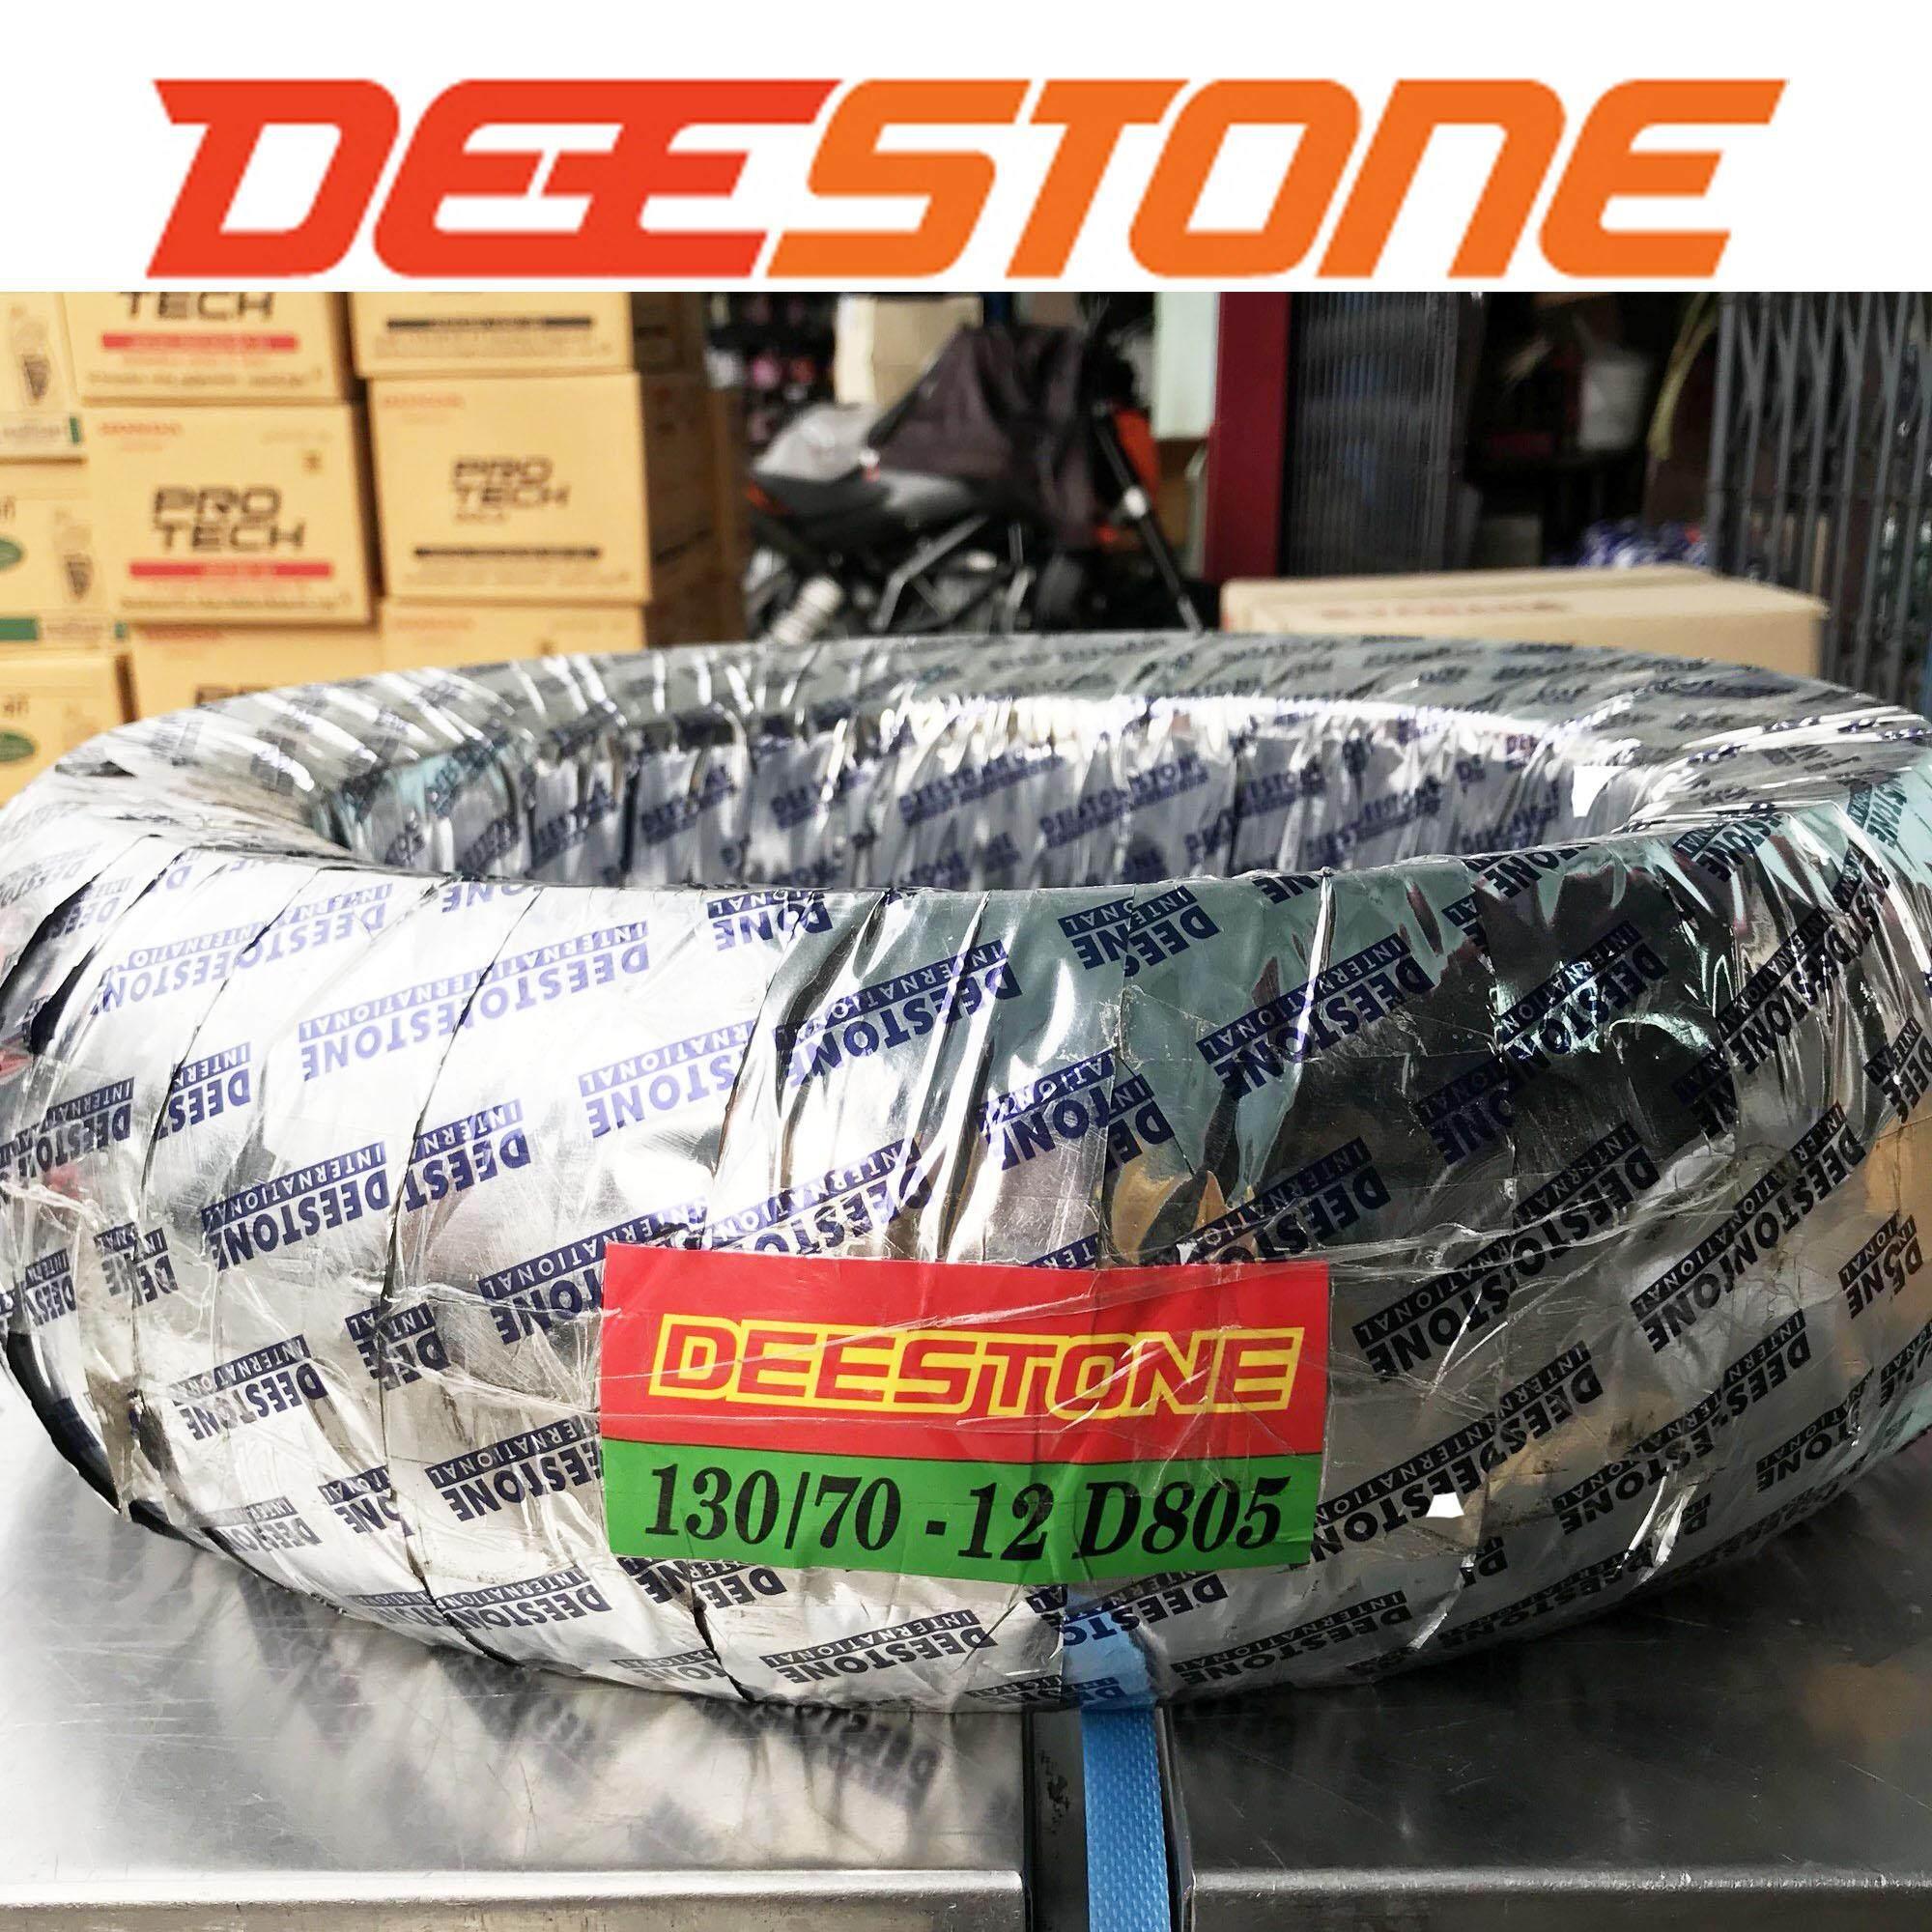 Deestone ดีสโตน ยางนอก รุ่น D805 Tl 130/70-12 ไม่ต้องใช้ยางใน (1 เส้น) สำหรับ Msx125, Qbix.